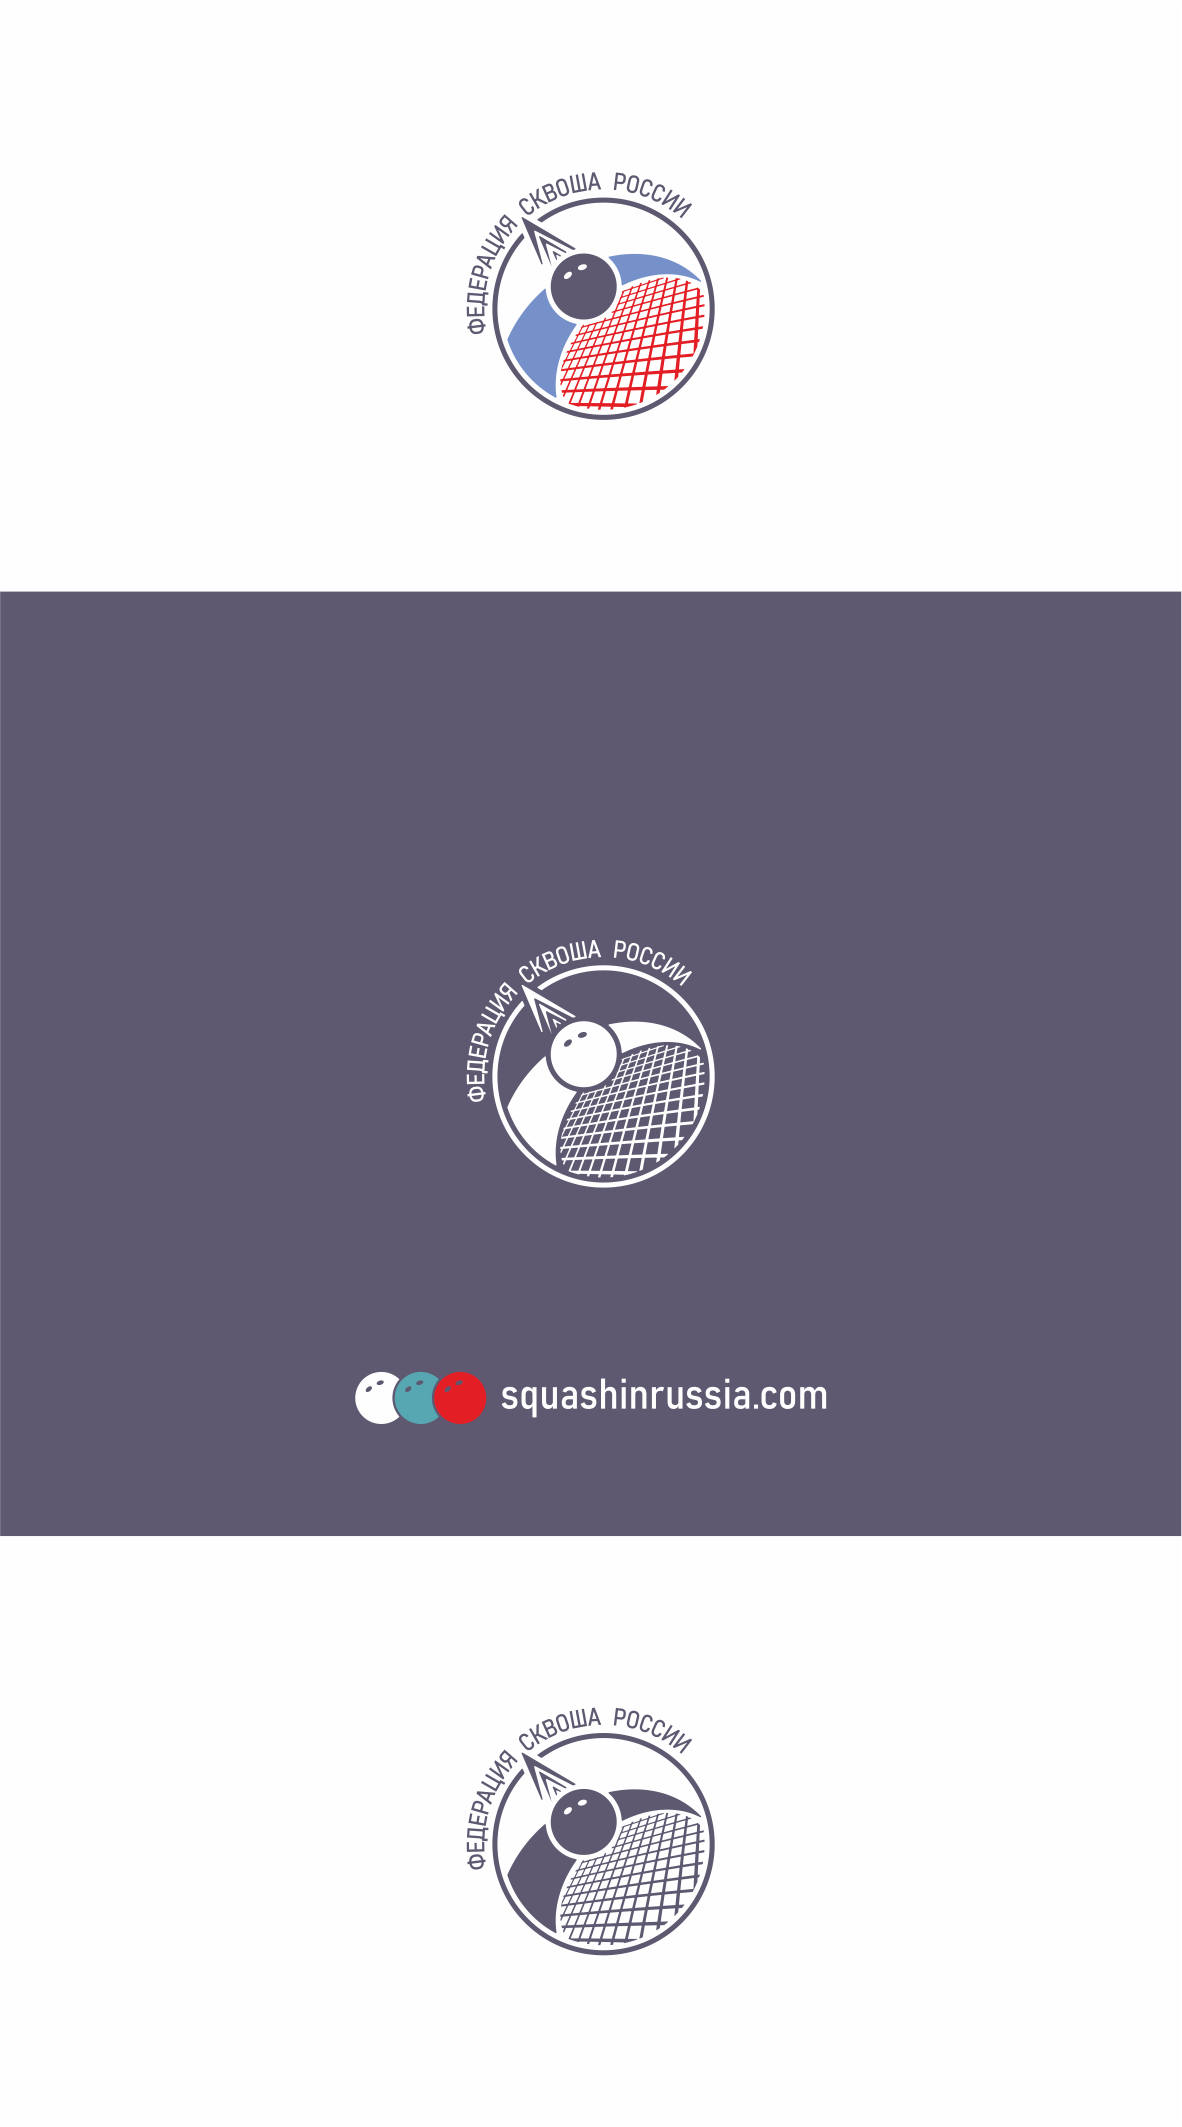 Разработать логотип для Федерации сквоша России фото f_8465f3234afab733.png